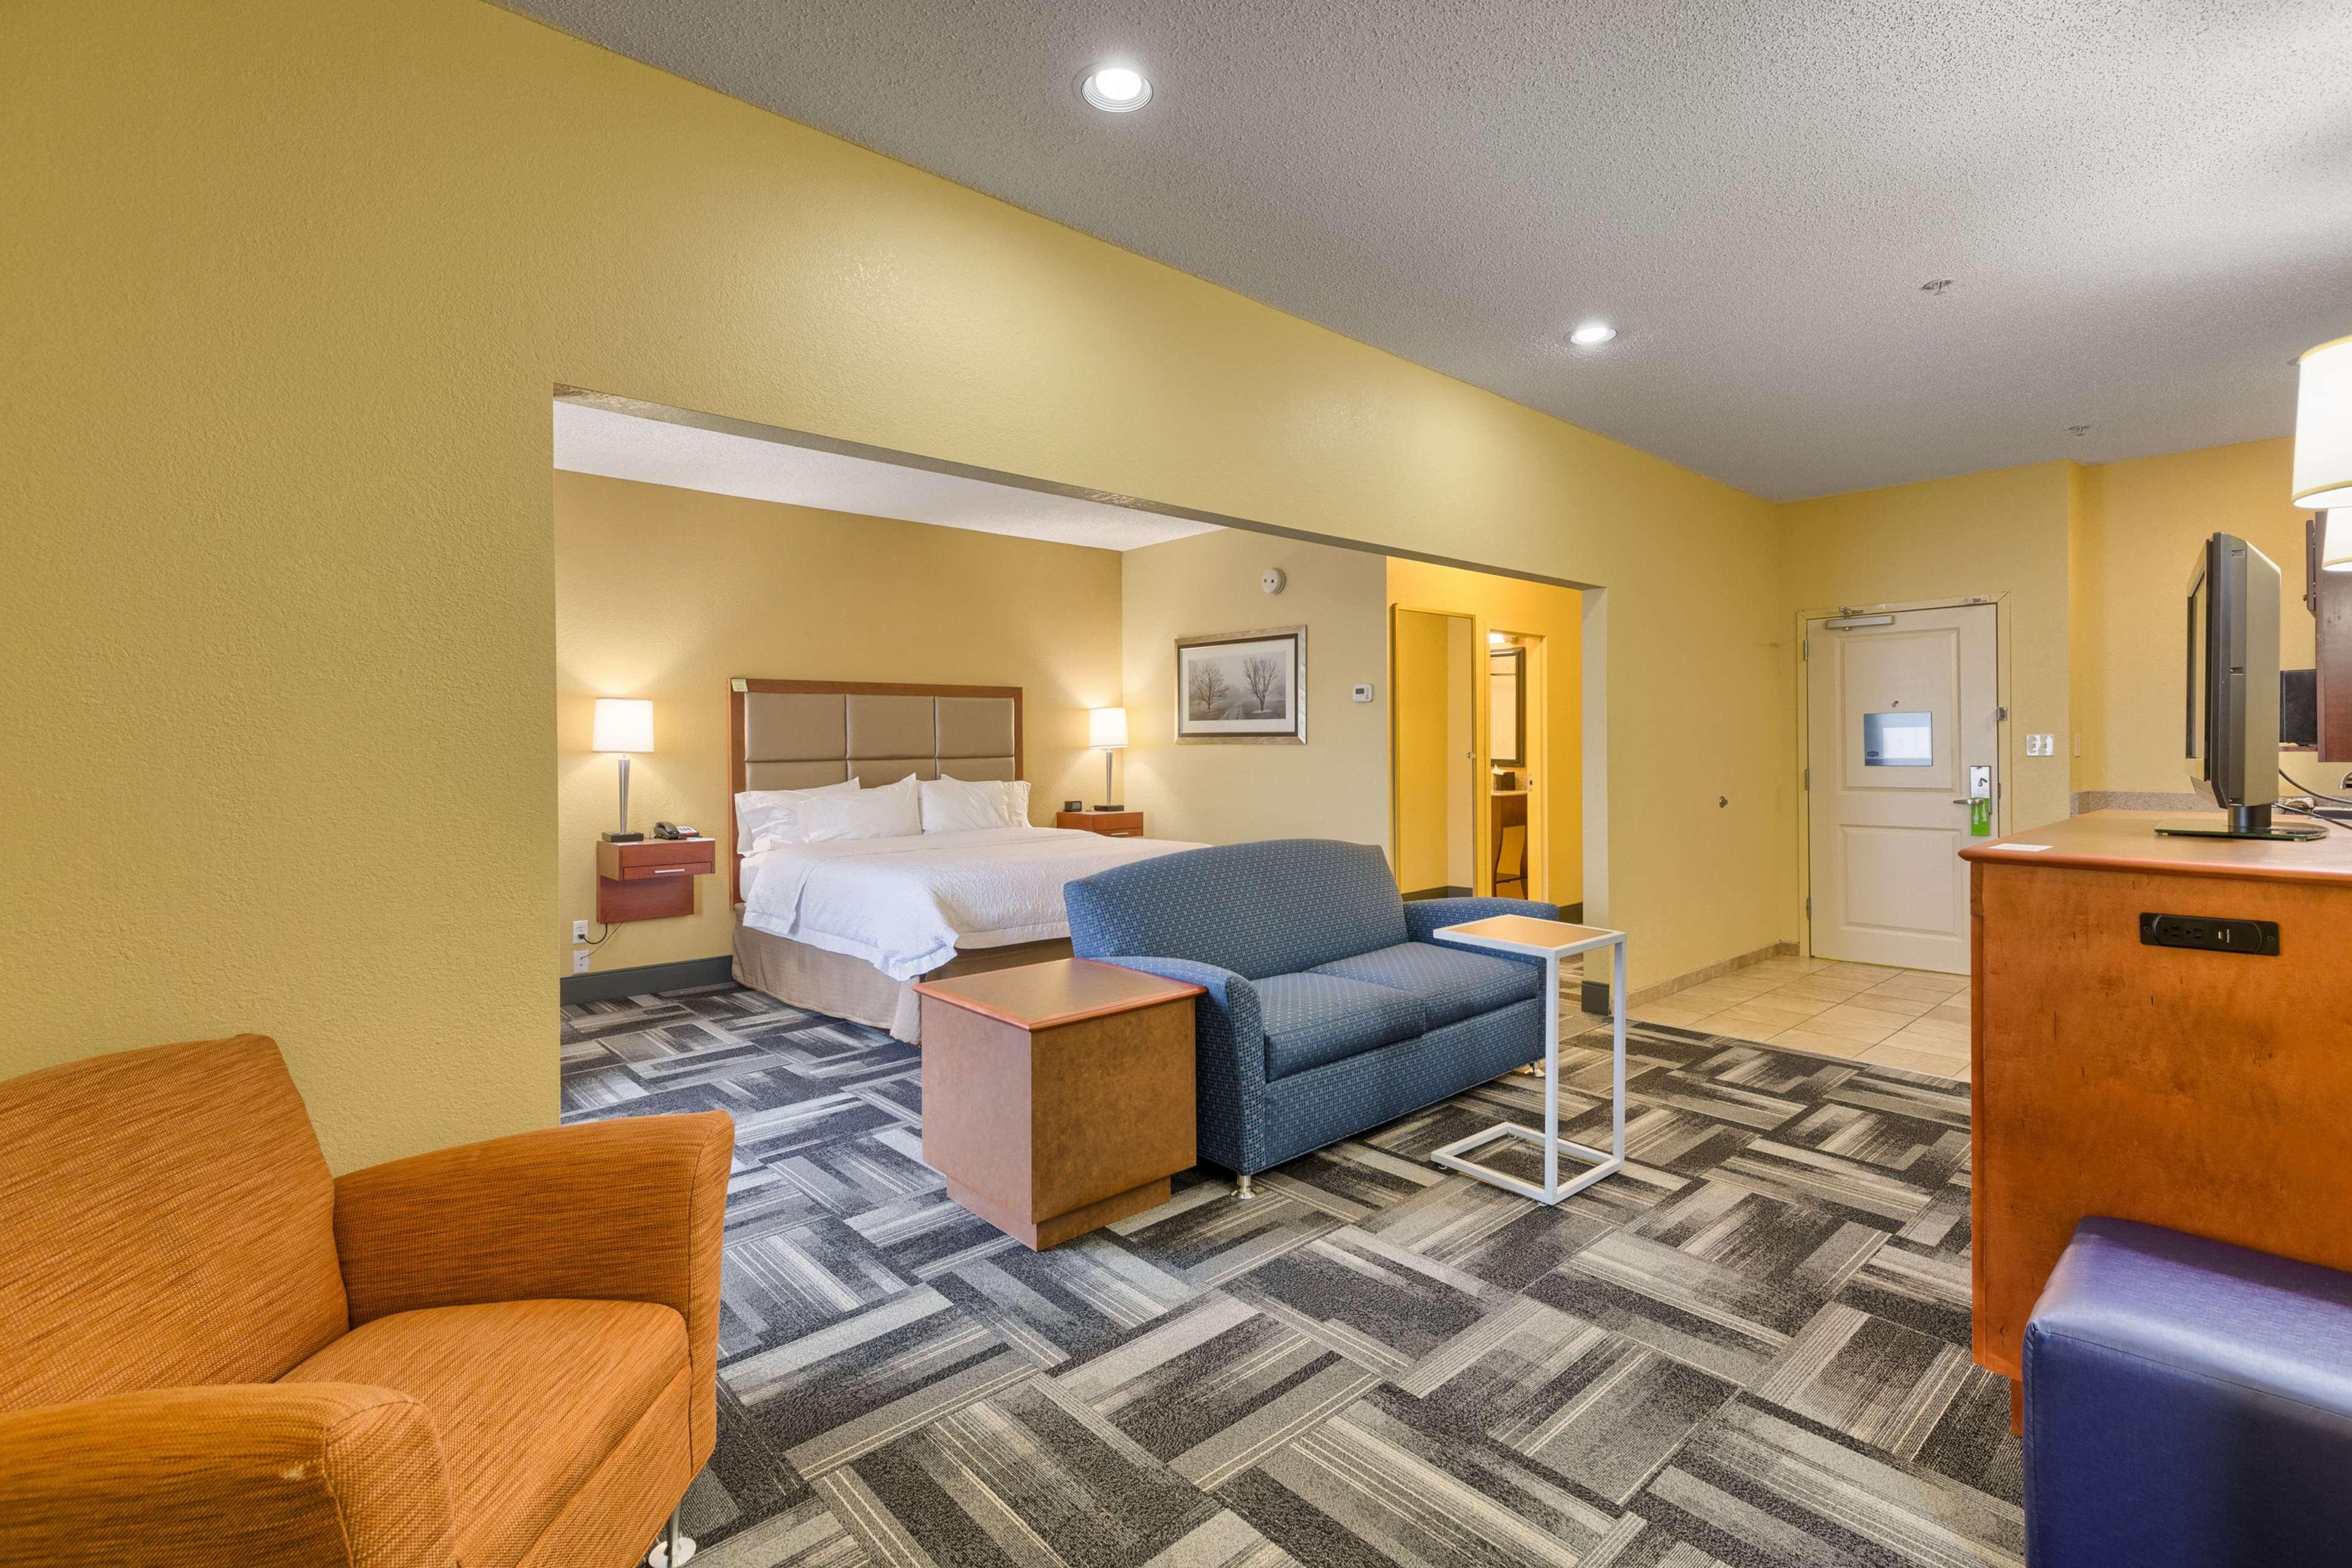 hampton inn owensboro south in owensboro ky 42303. Black Bedroom Furniture Sets. Home Design Ideas